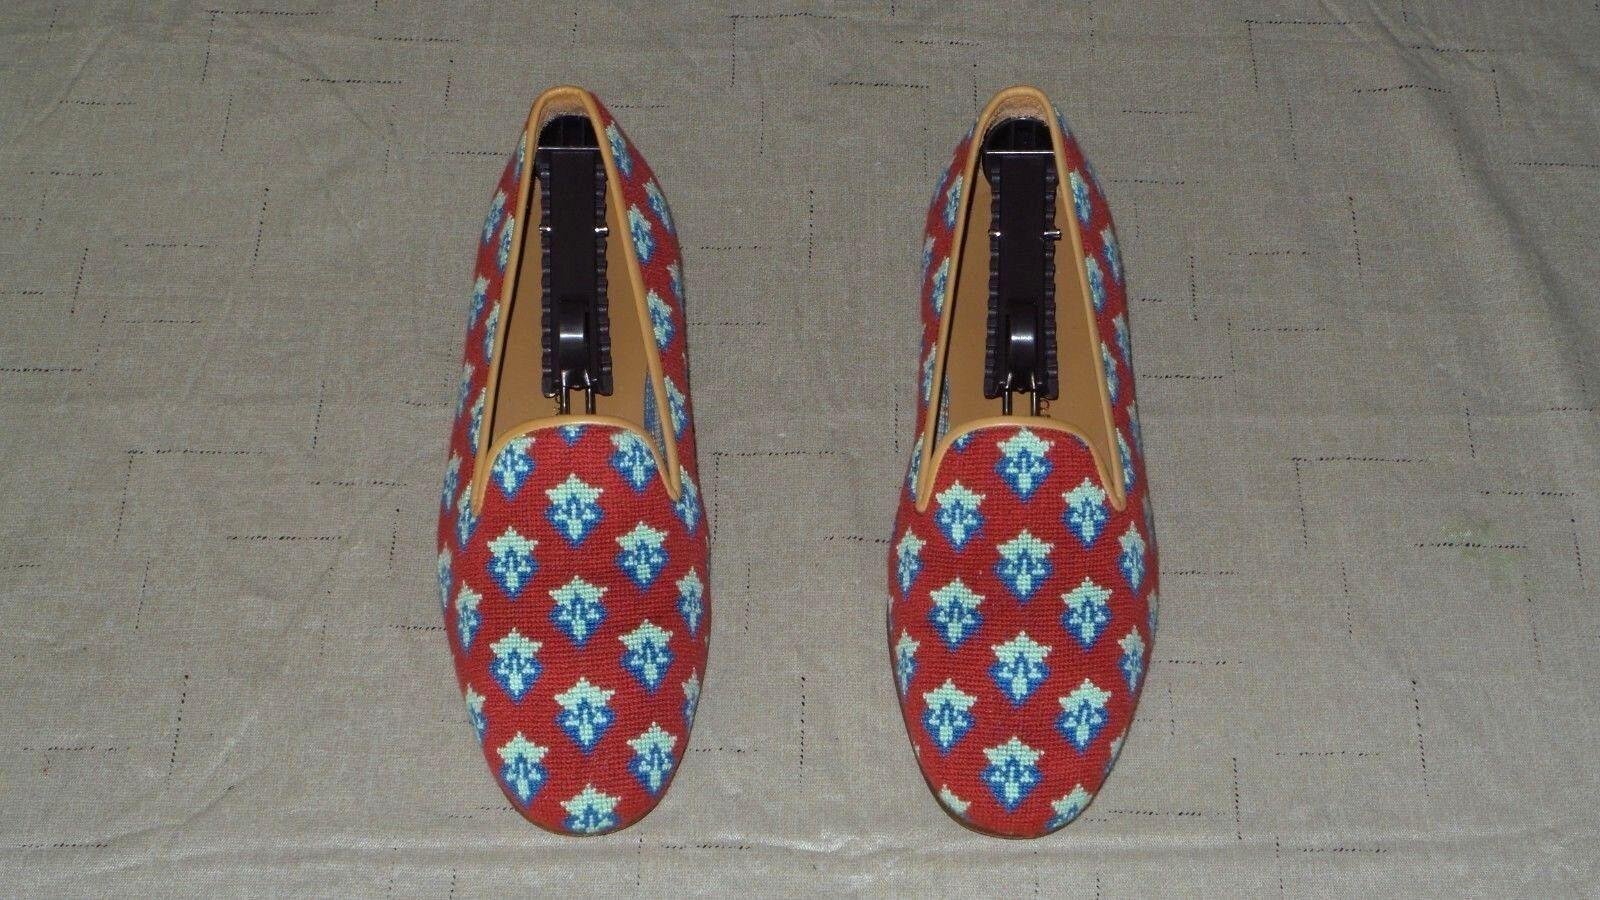 salutare RARE  Uomo  495 Stubbs Stubbs Stubbs & Wootton Needlepoint & Leather Slippers Loafers scarpe  con il 60% di sconto